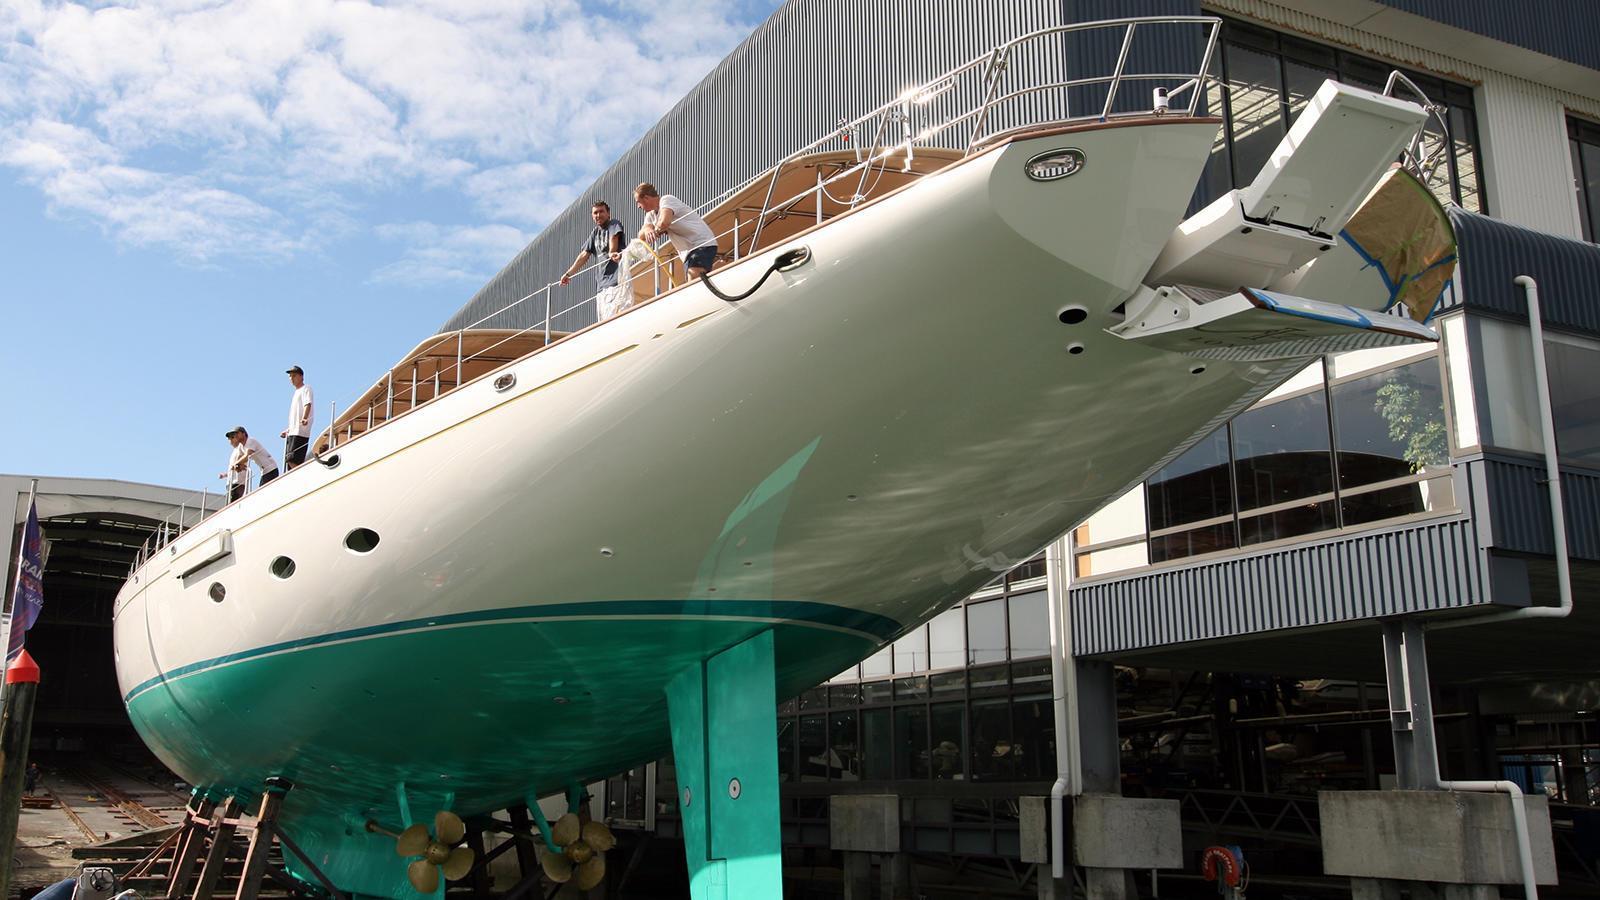 athos-sailing-yacht-holland-jachtbouw-2010-62m-hull-shipyard-refit